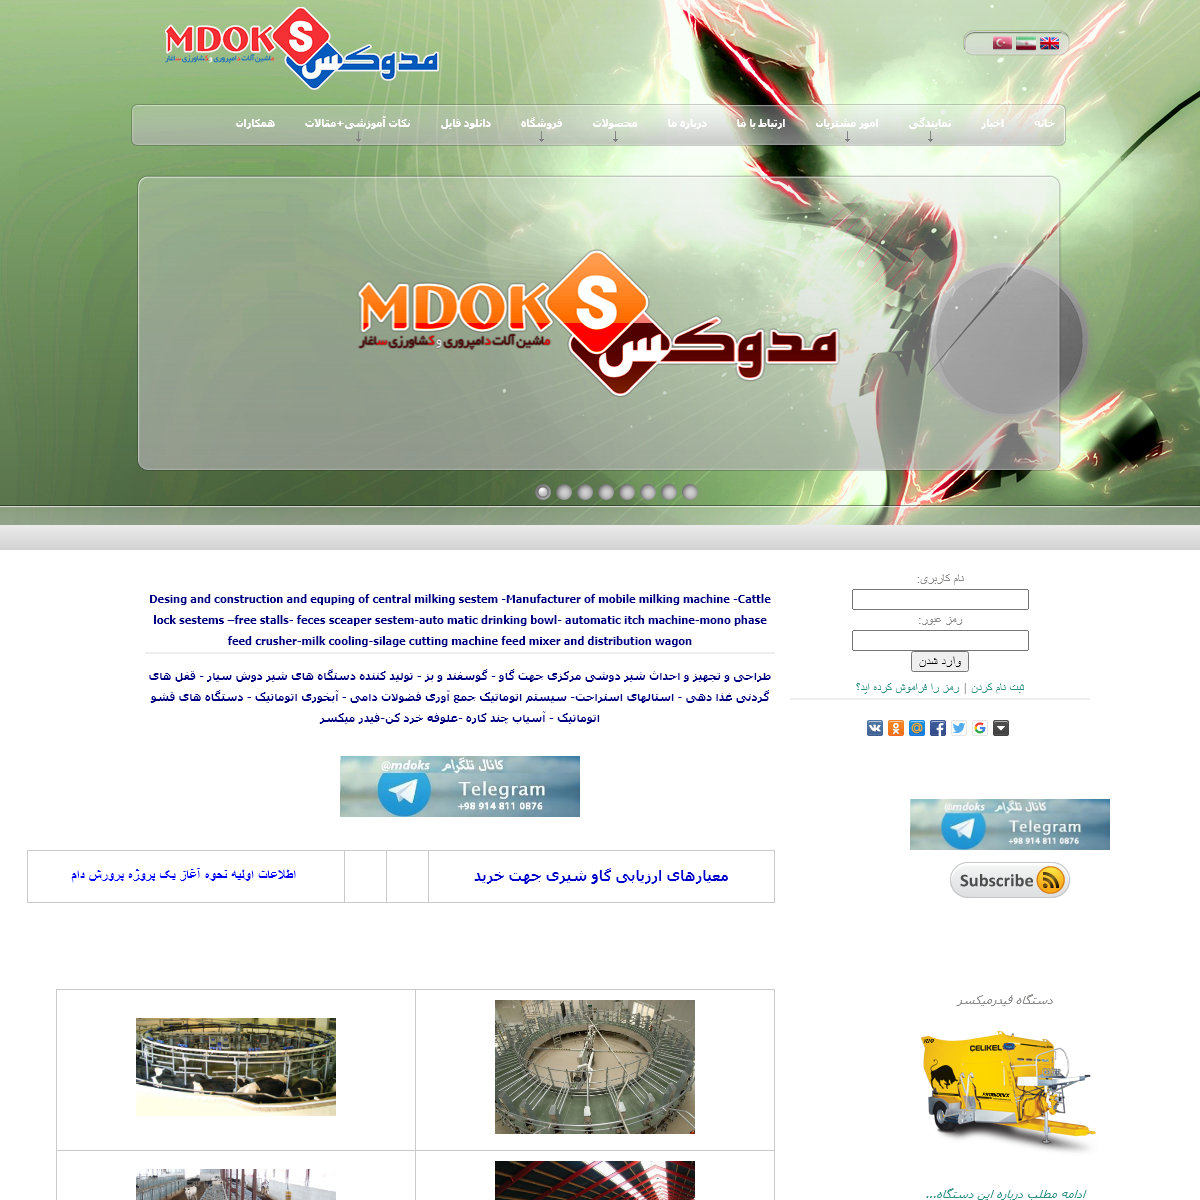 مدوکس , ماشین آلات دامپروری و کشاورزی ساغار